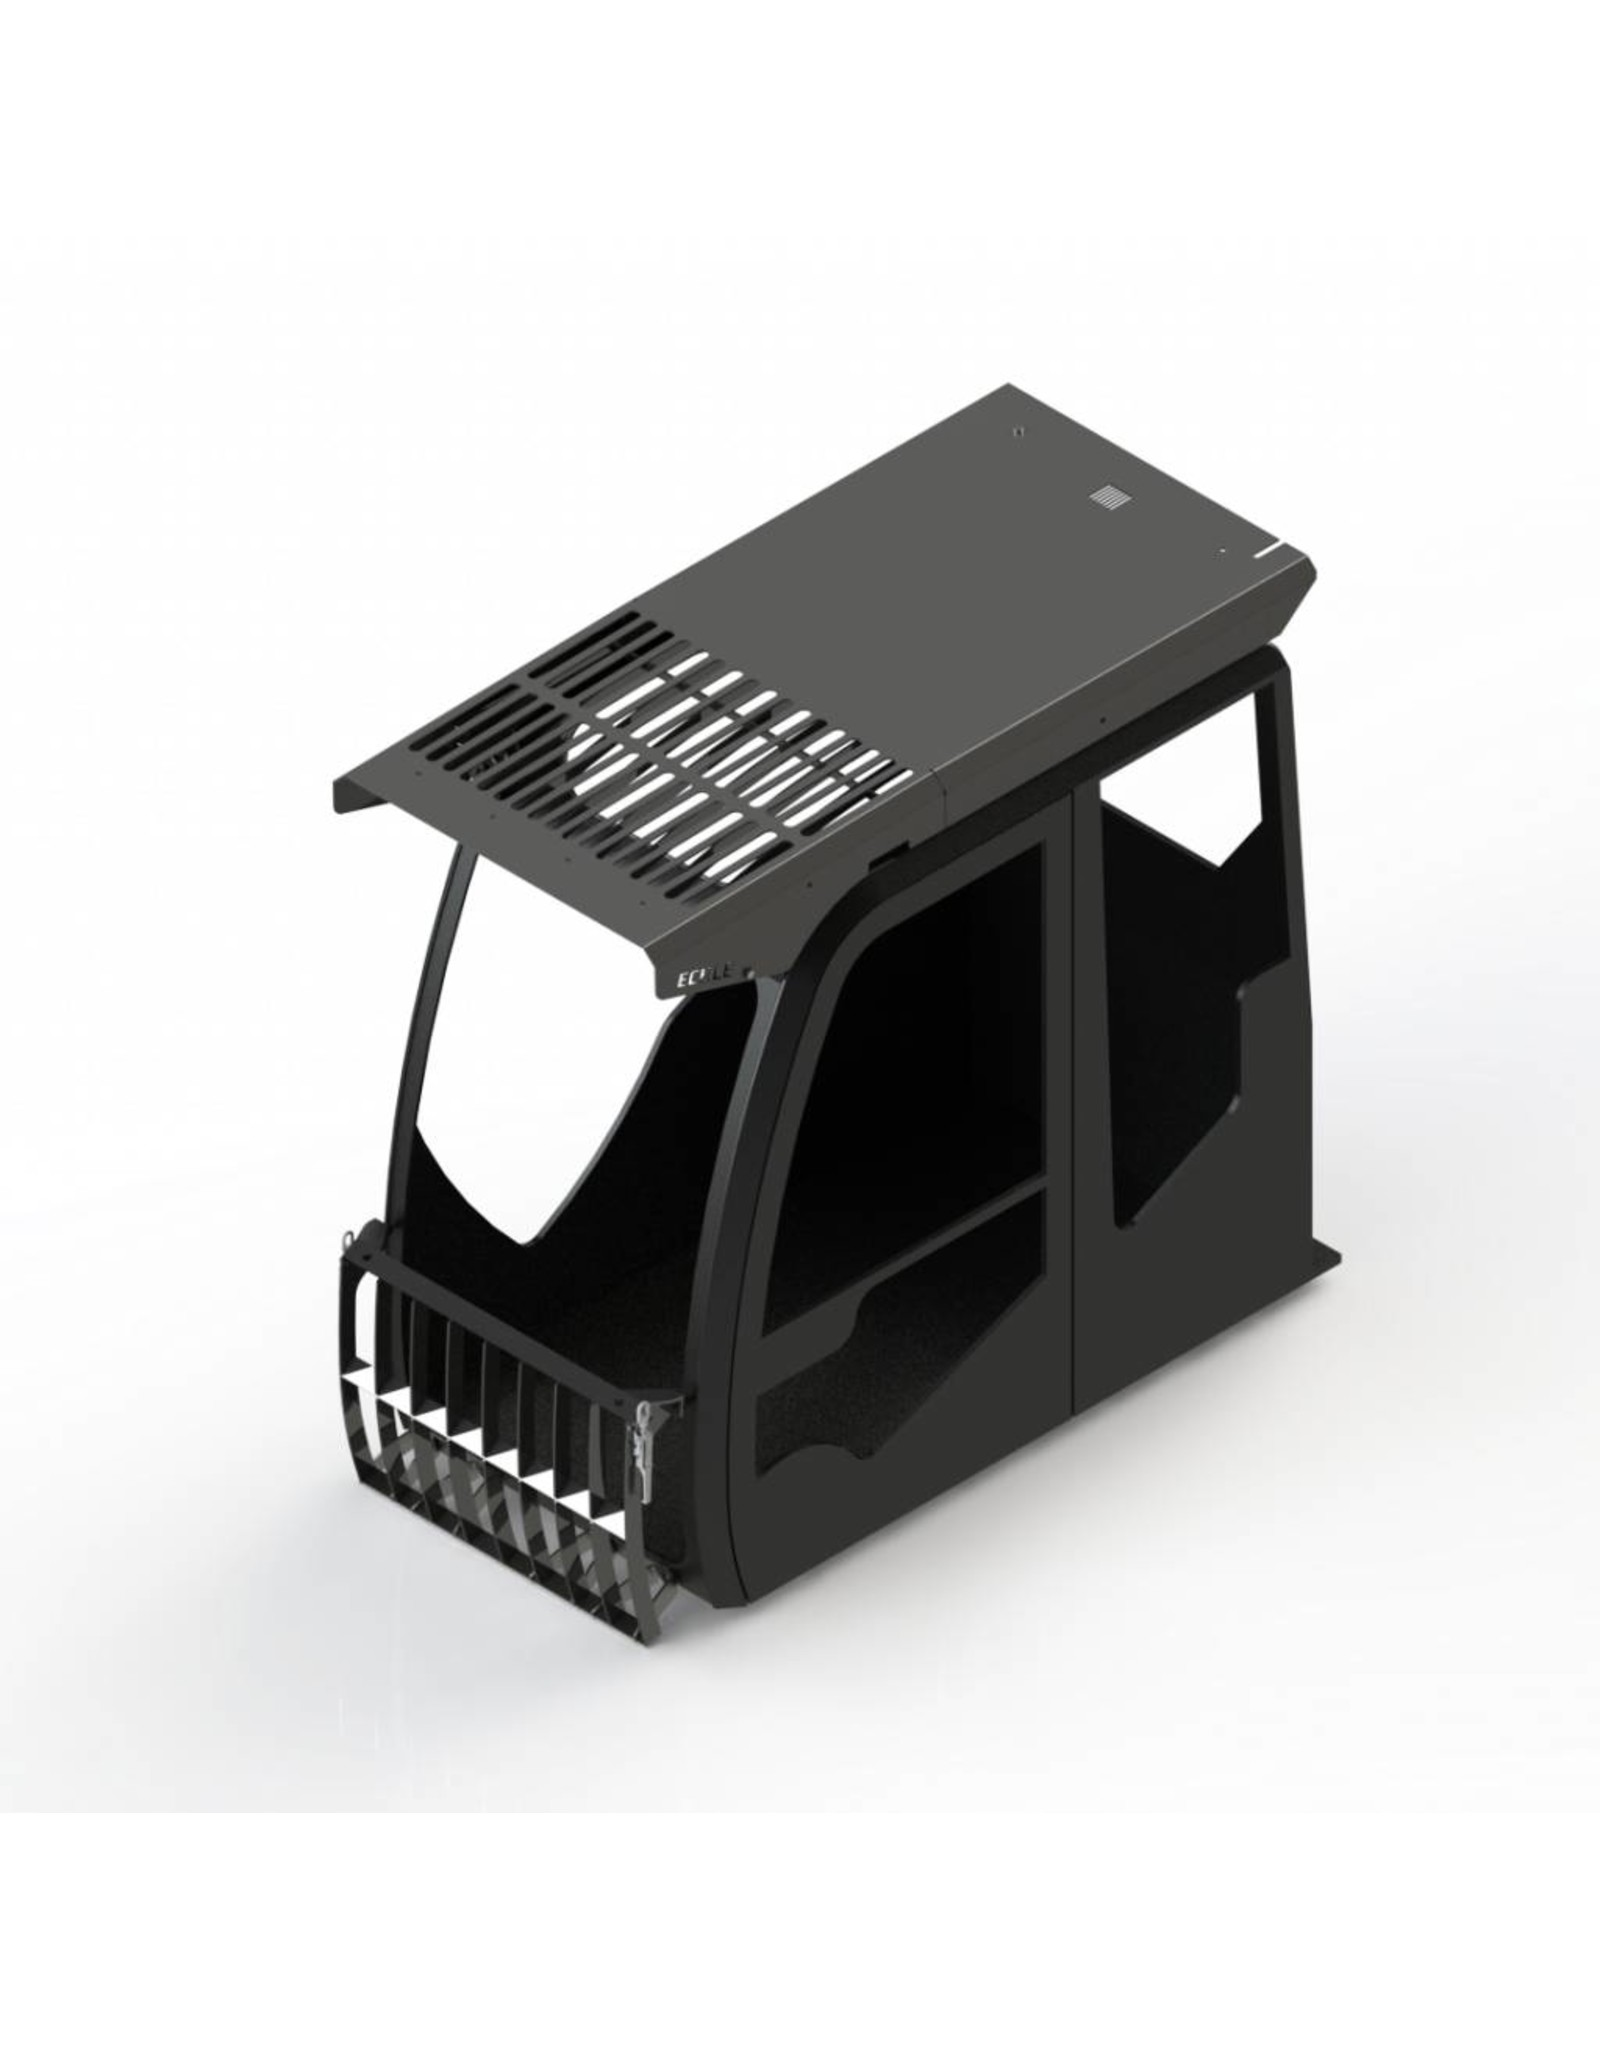 Echle Hartstahl GmbH FOPS for Hyundai HW140